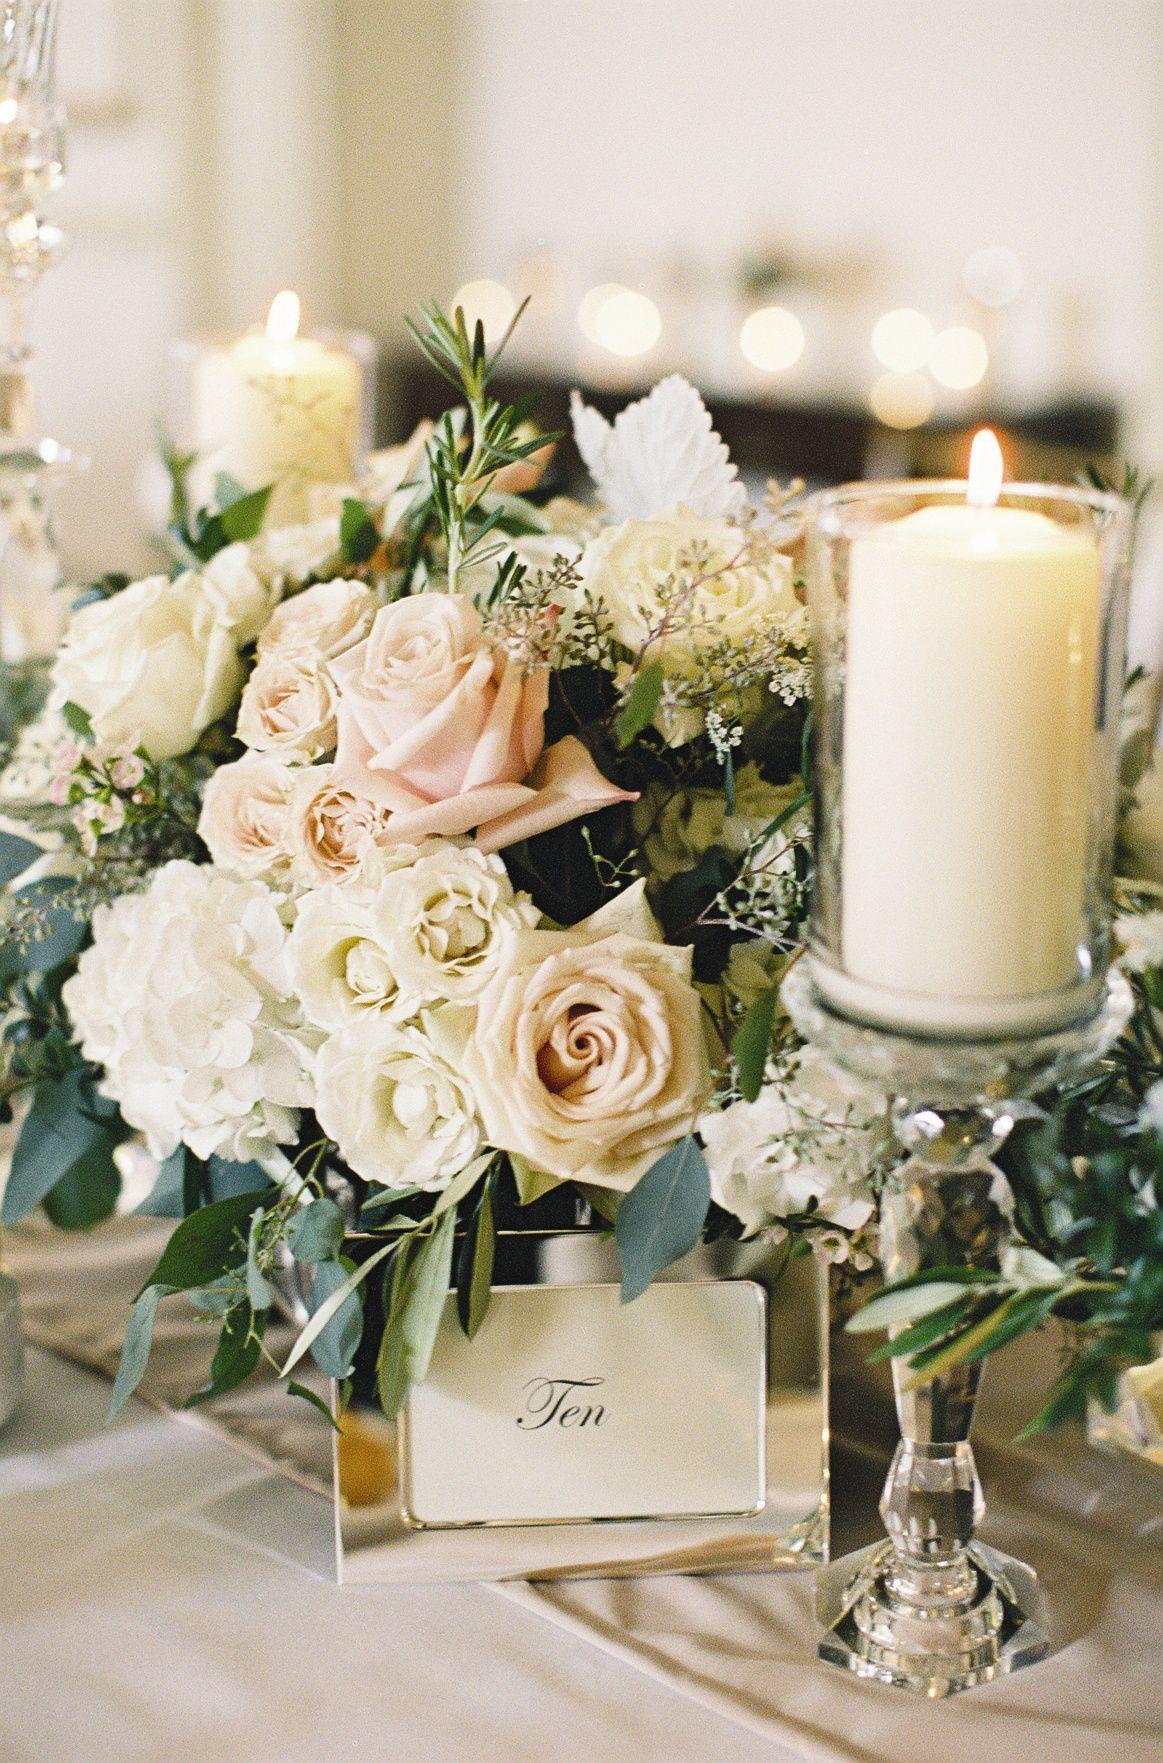 Single Rose Glass Vase Of 26 Most Insta Worthy Flower Ideas Weve Ever Seen within Dfa17dfb Ddb2 49c1 B7b4 72b07a7887ae